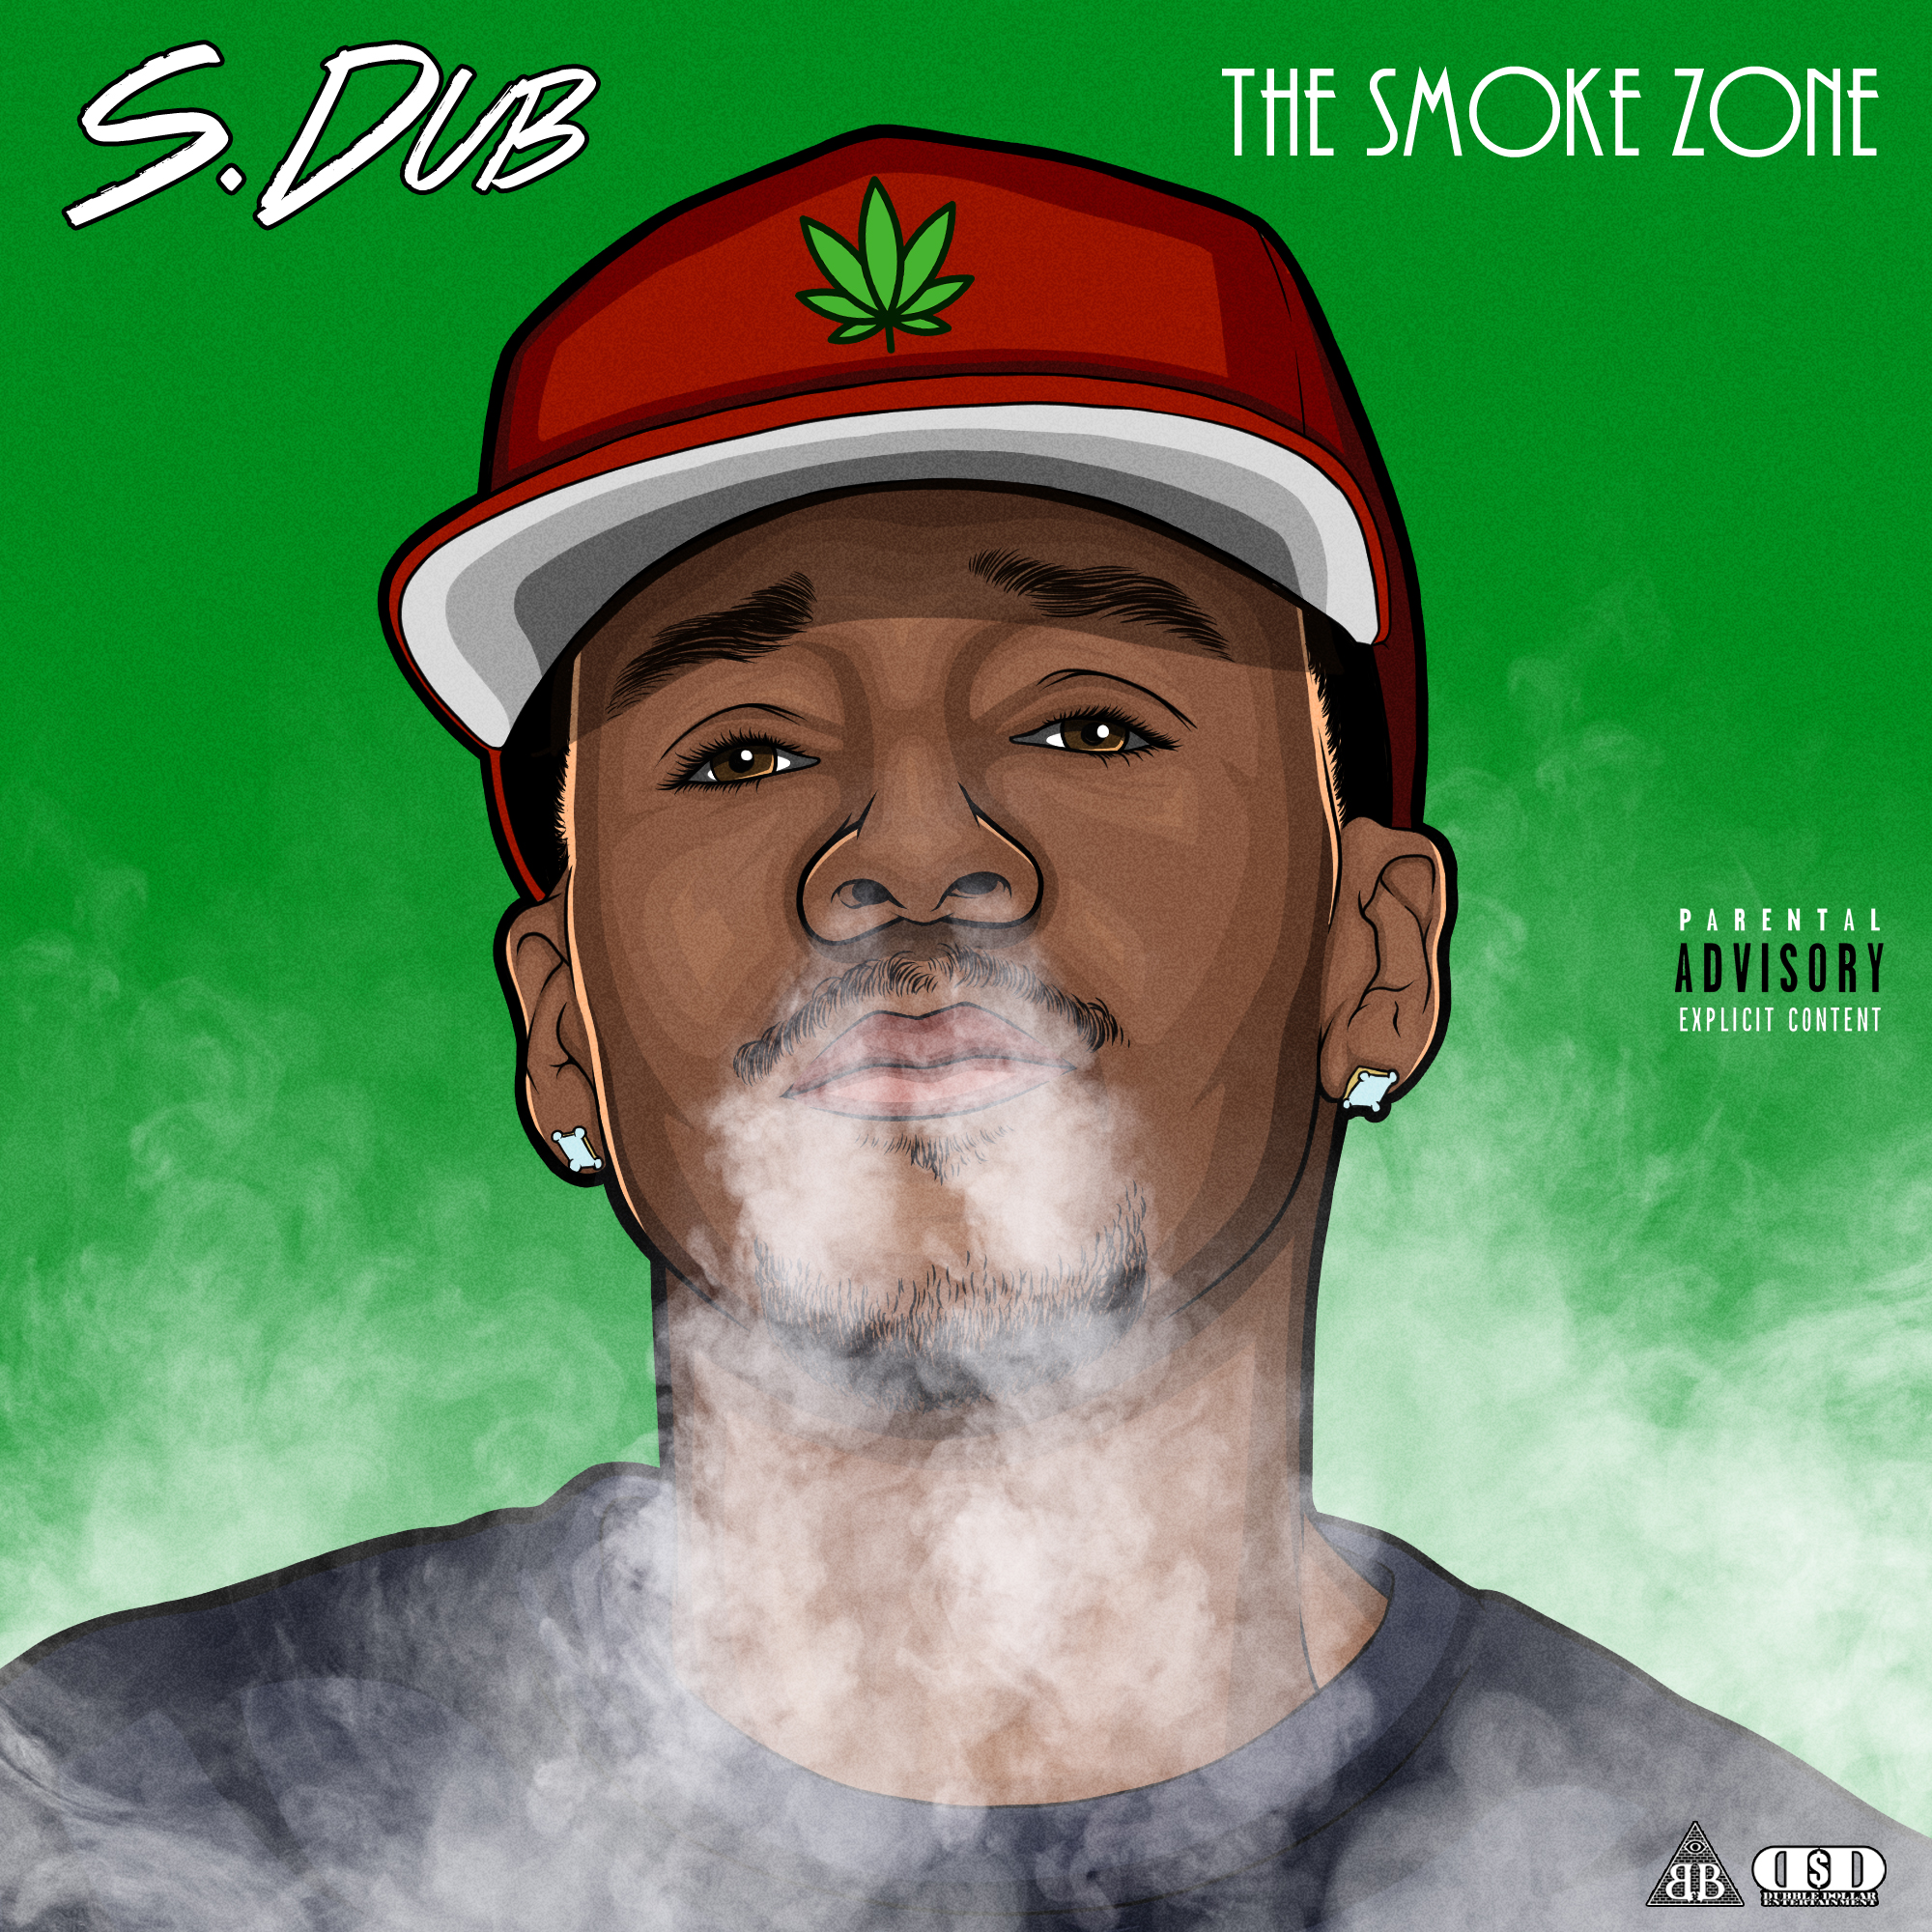 The Smoke Zone